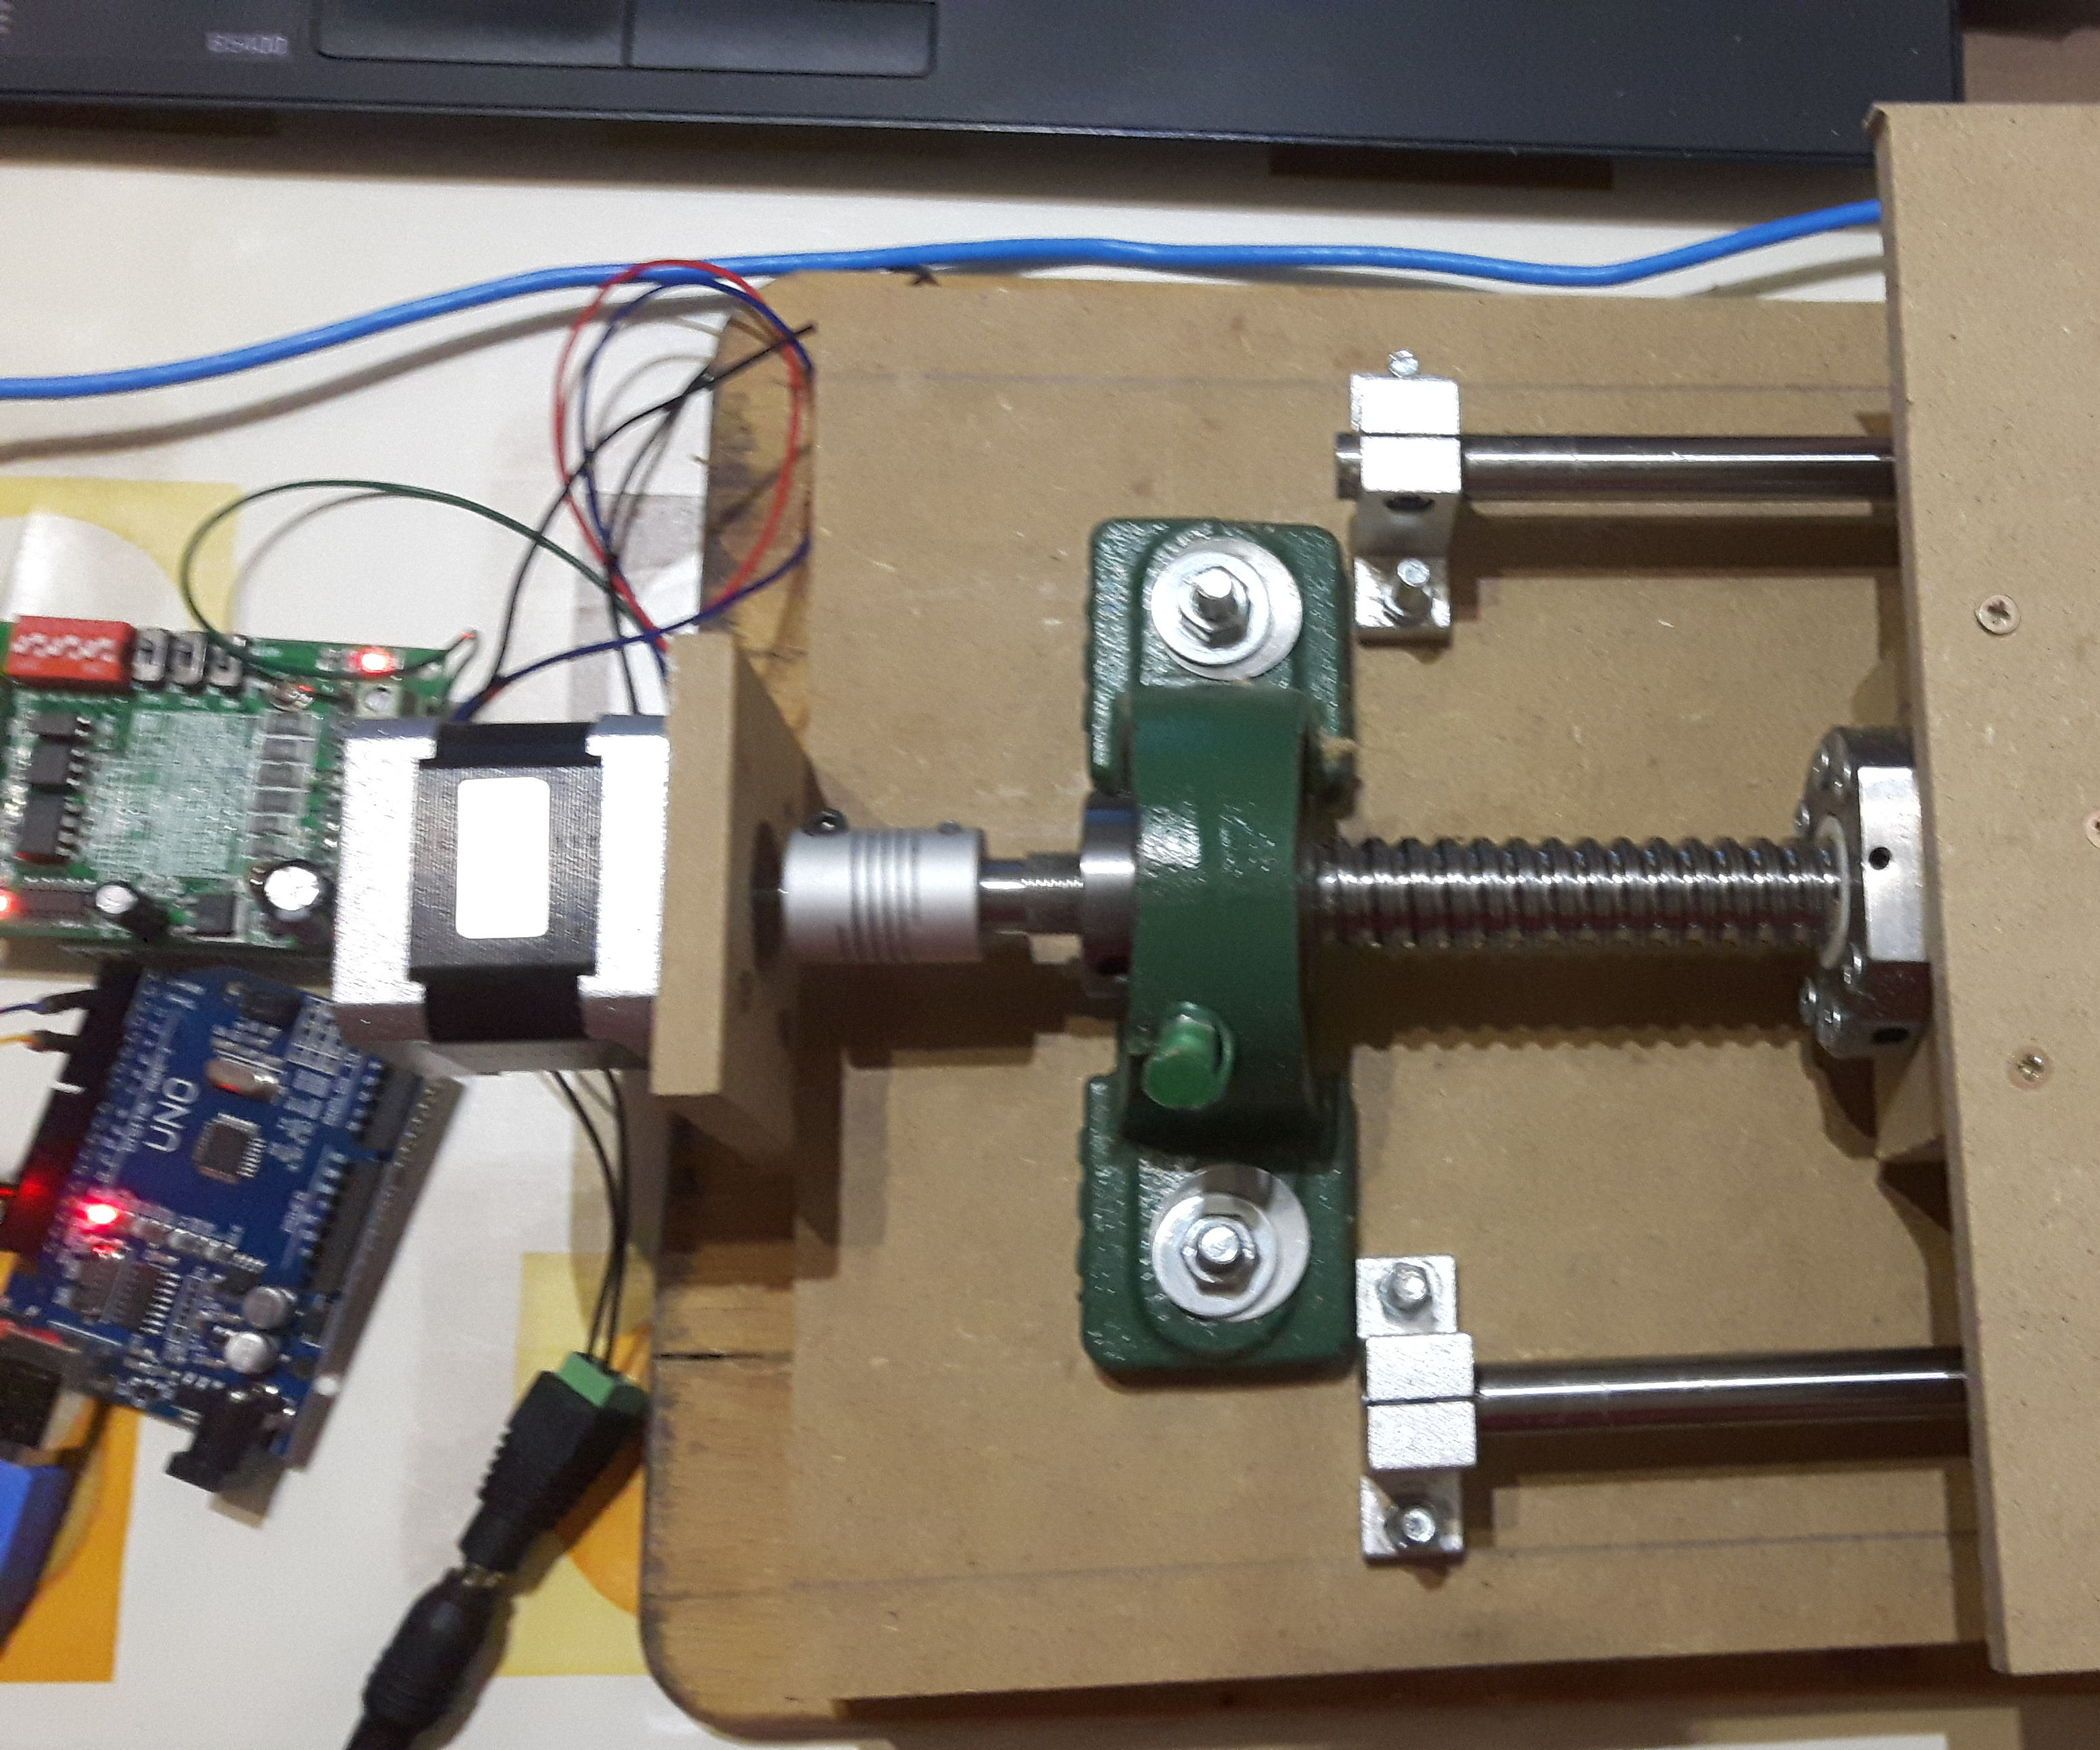 Homemade cnc milling machine v arduino uno grbl